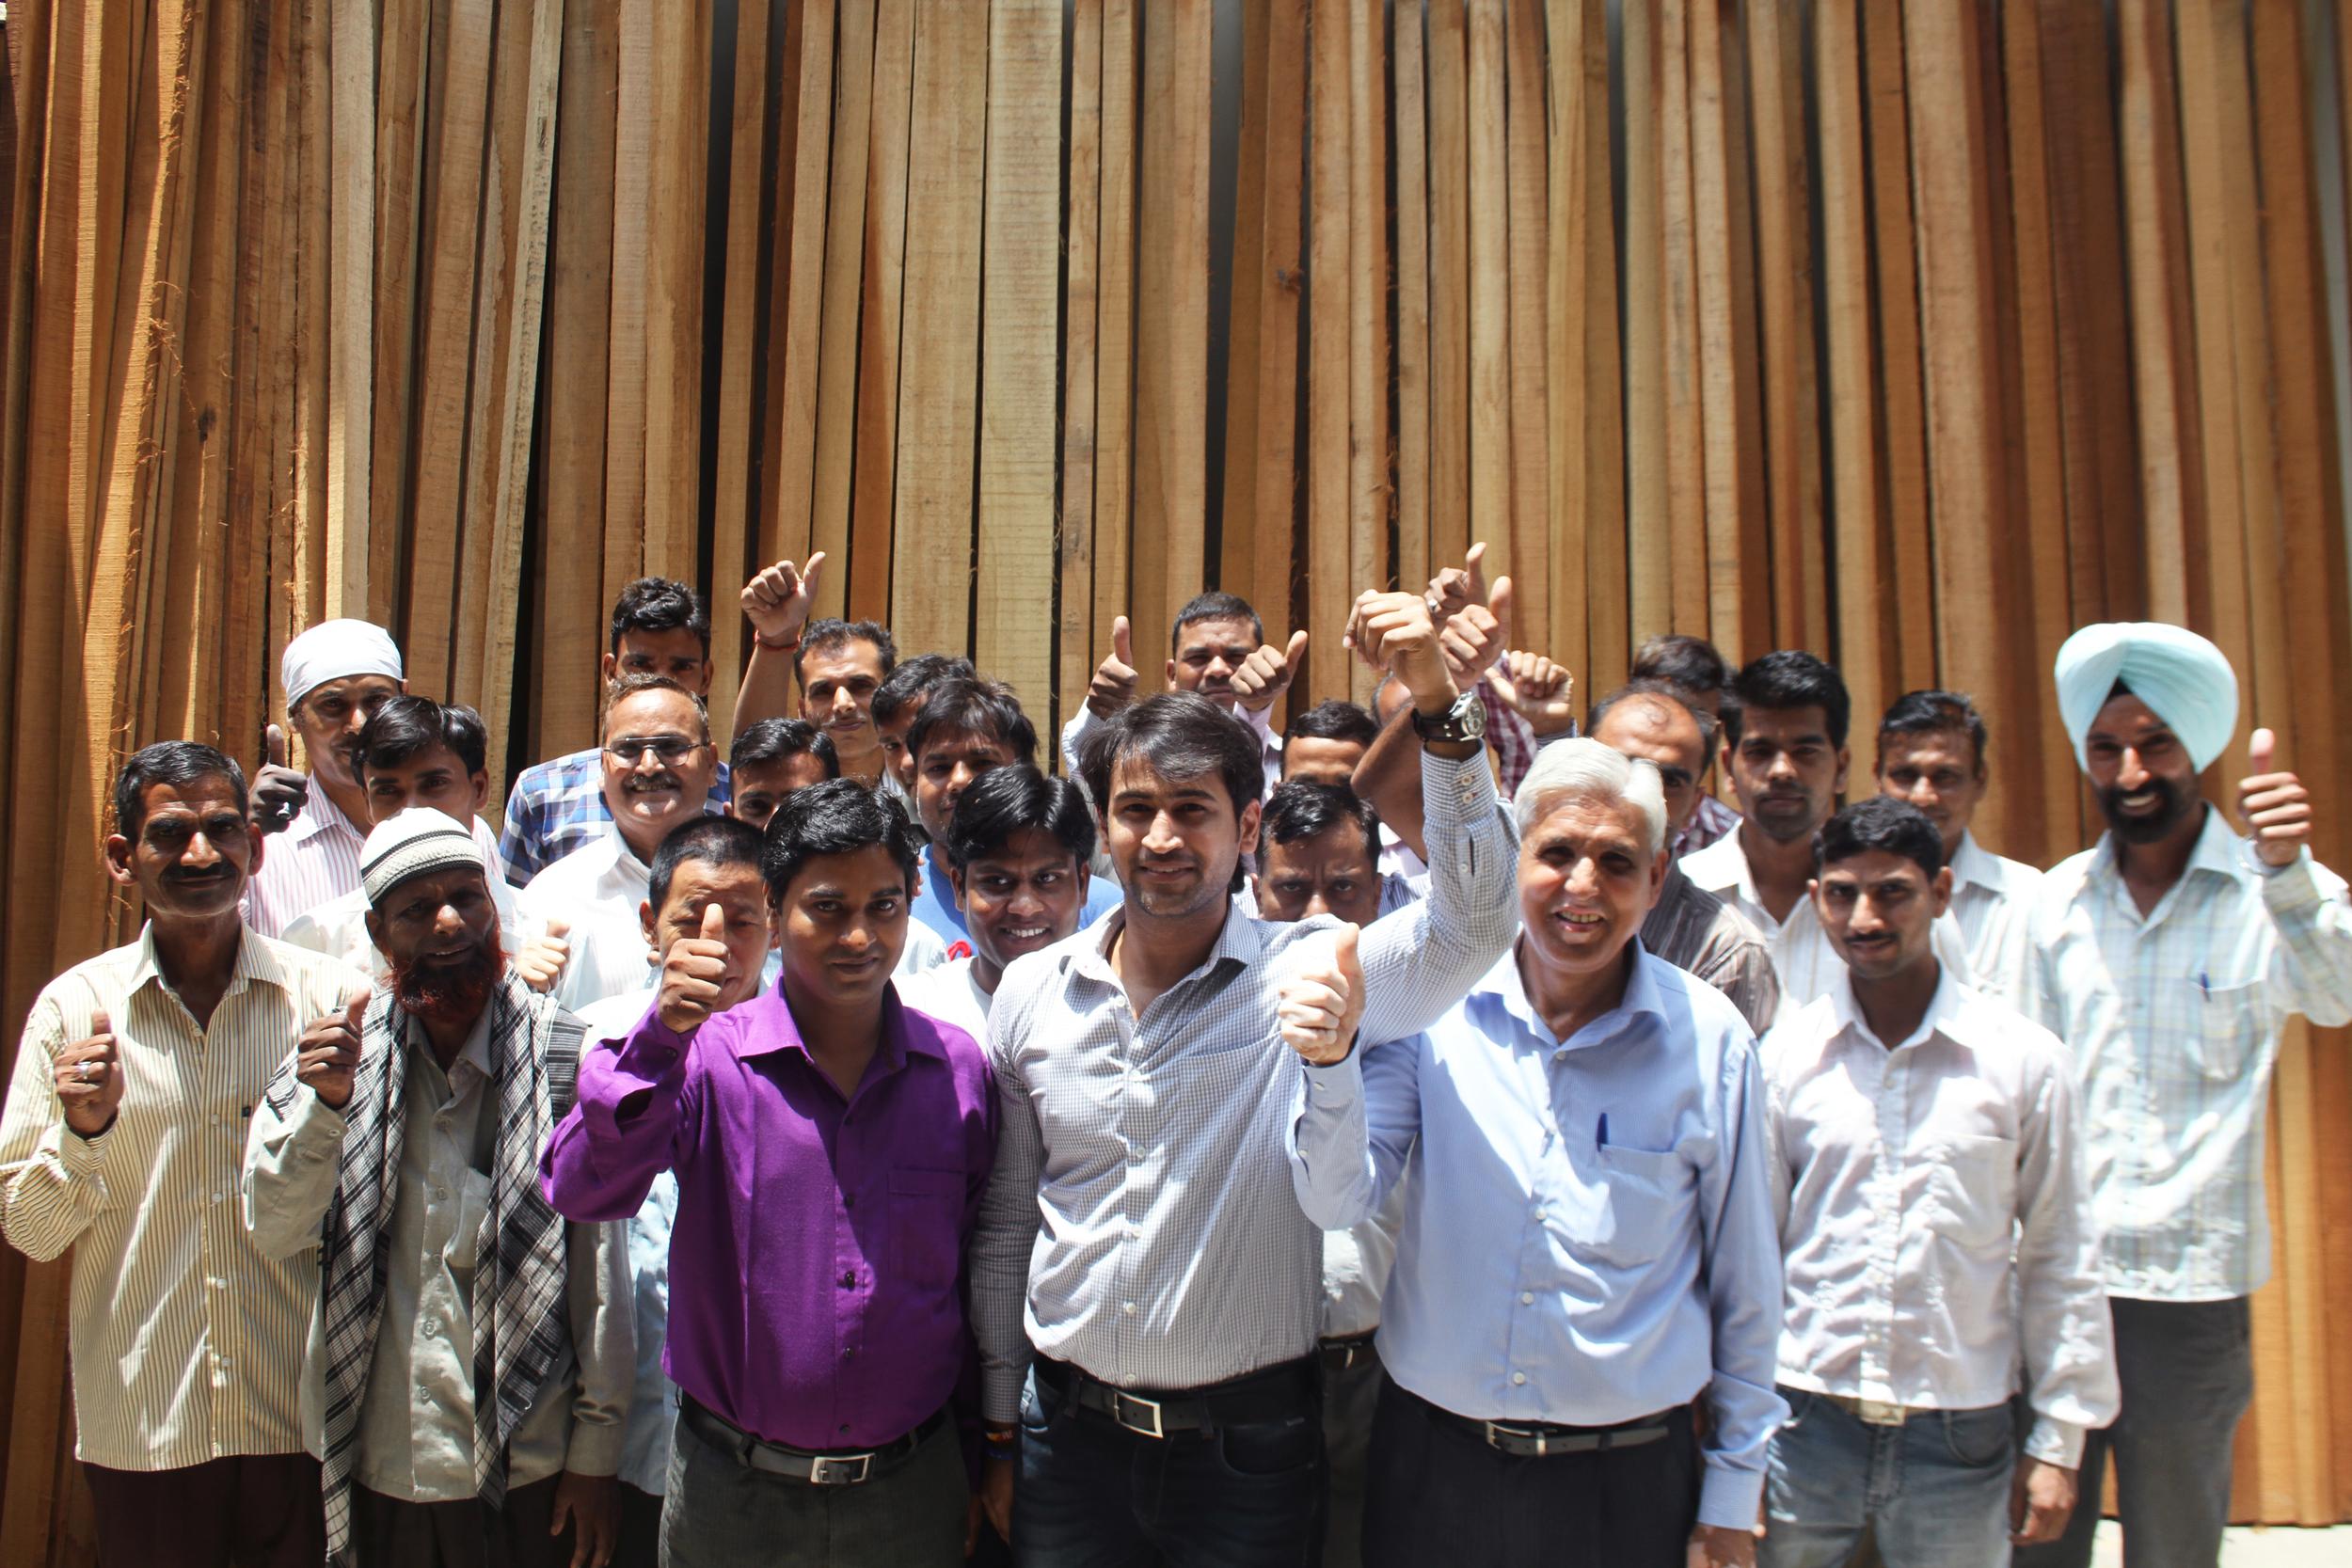 india craftsmen and furniture makers workshop